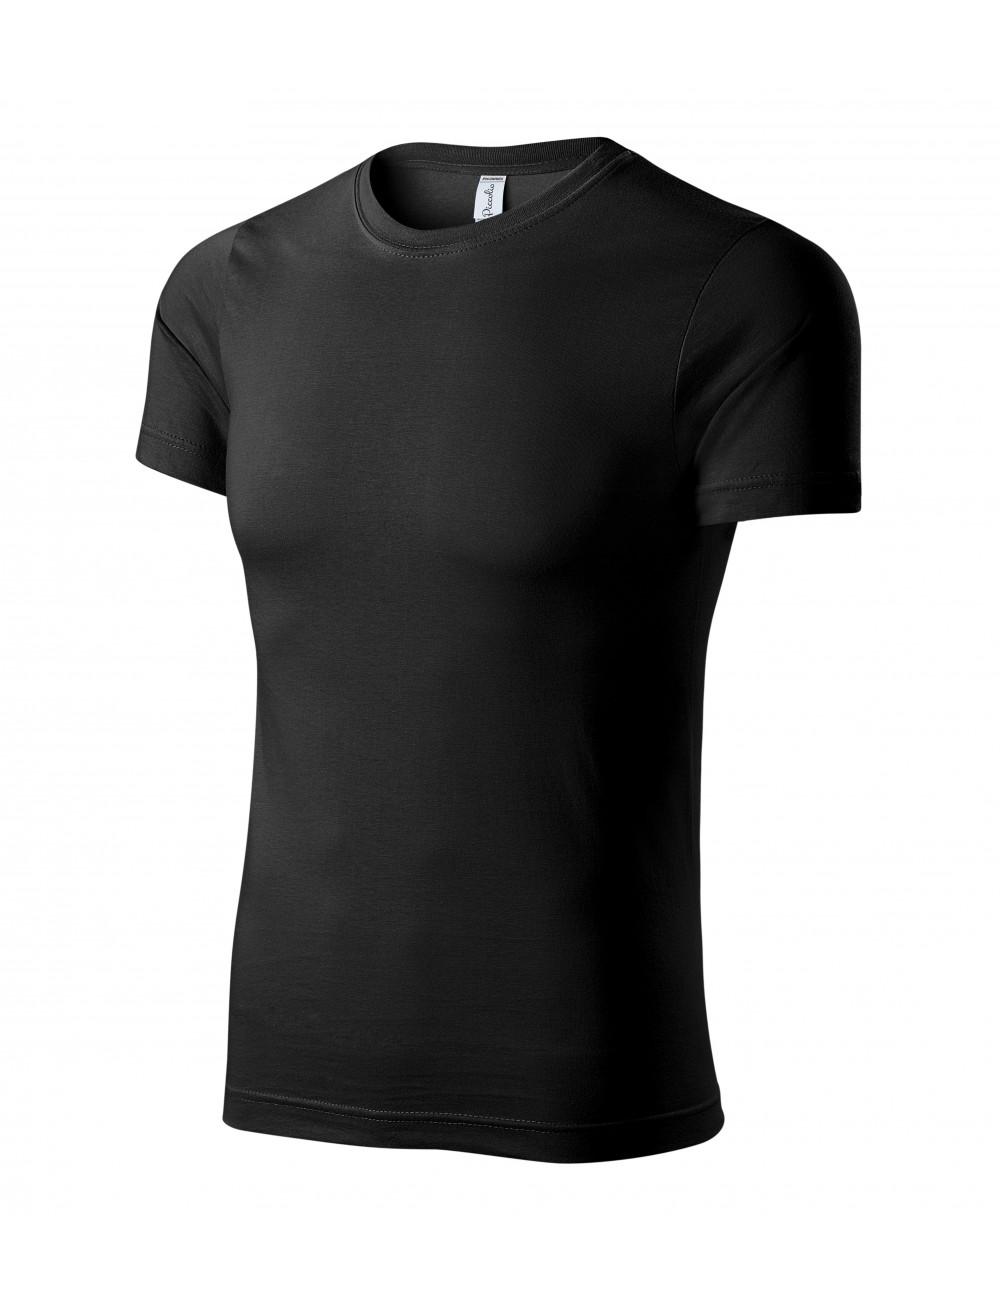 Adler PICCOLIO Koszulka unisex Peak P74 czarny